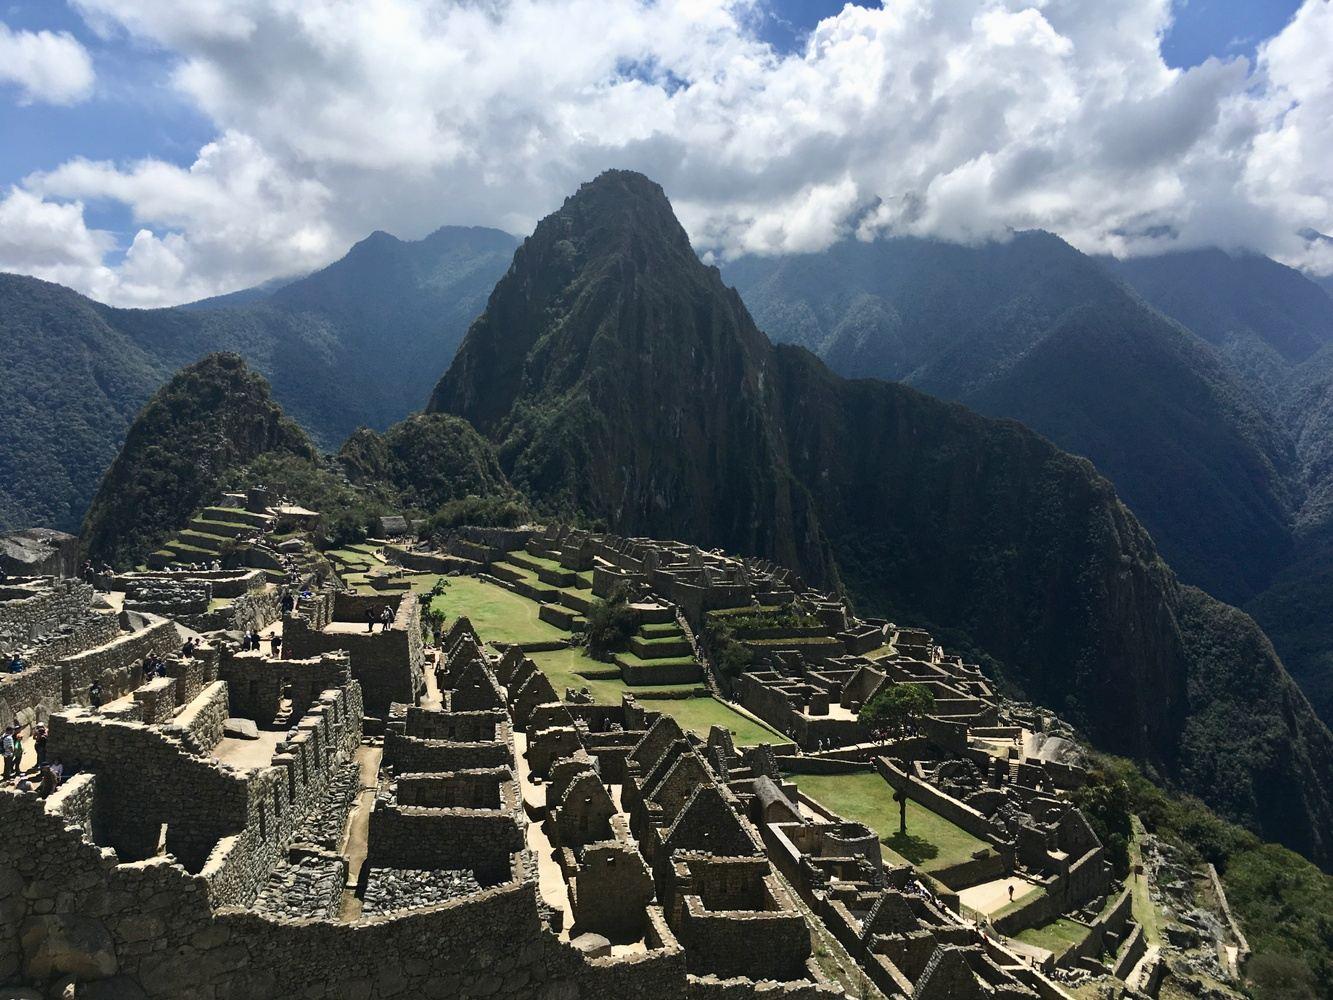 Mayfair Travel Exclusive - Explore Machu Picchu